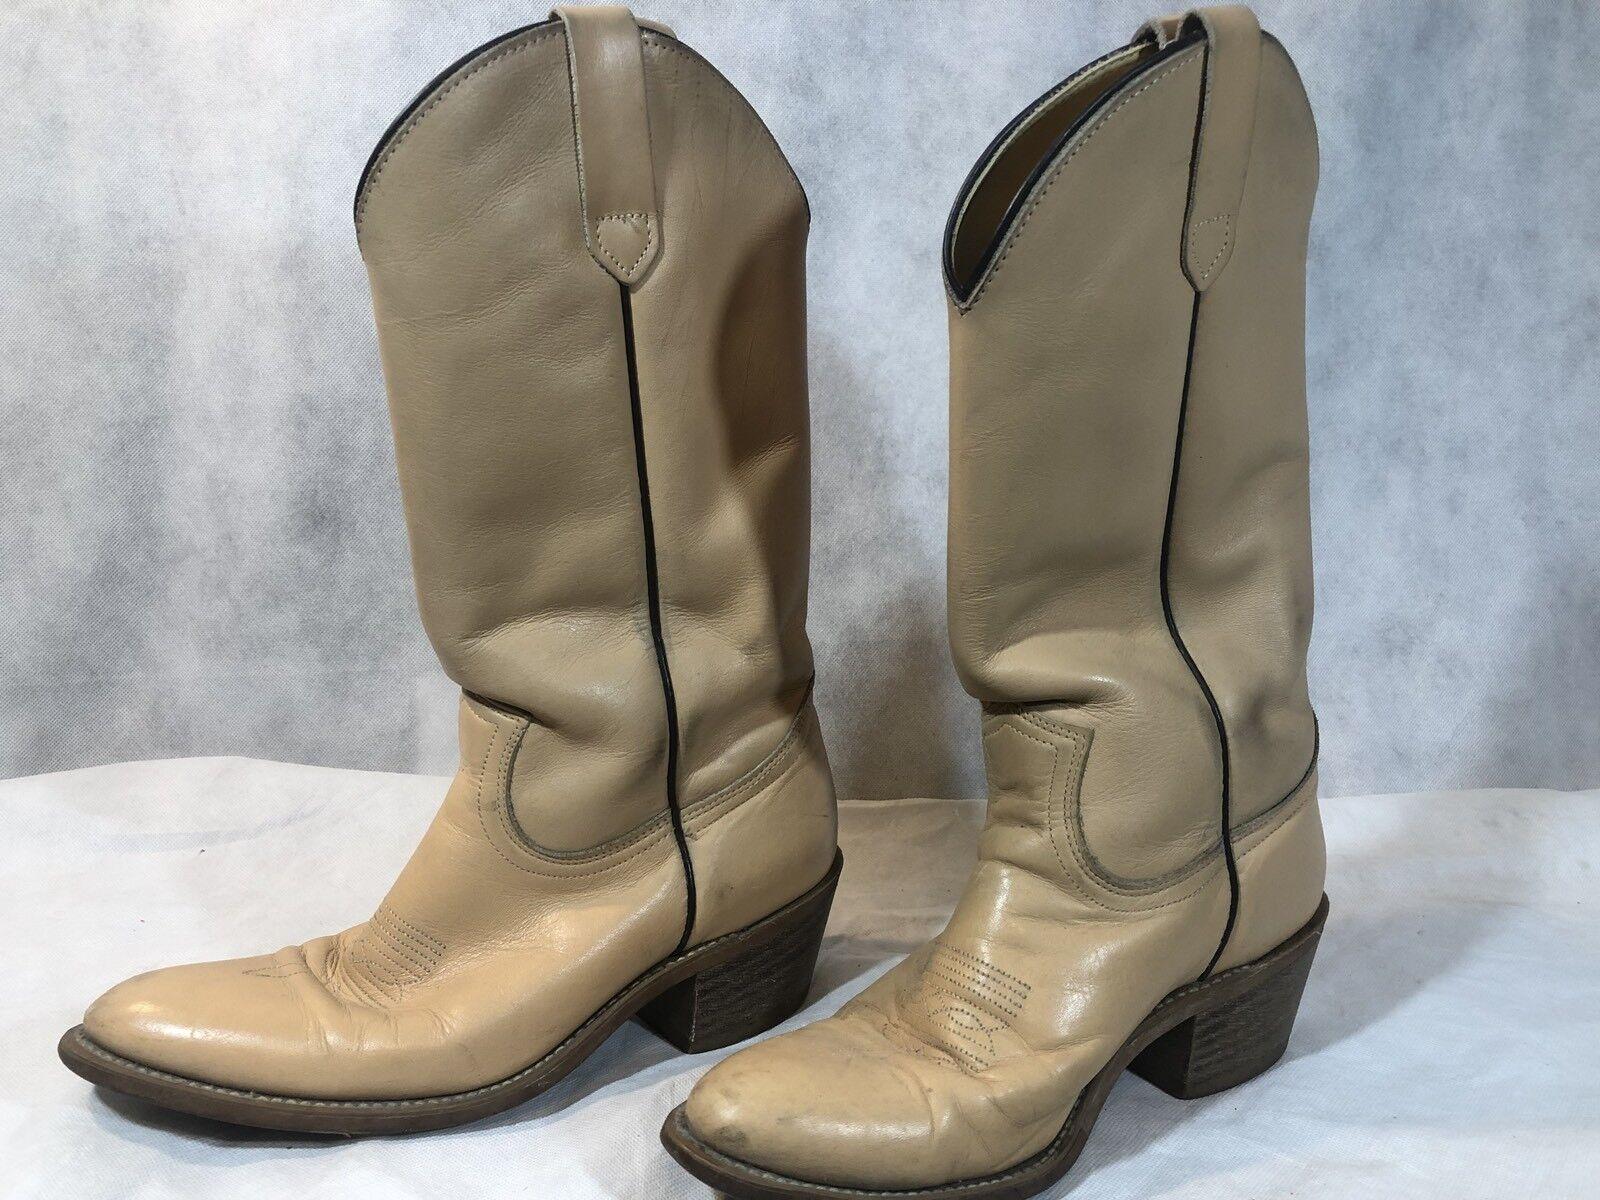 Frye Damen Hellbraun Tall Classic Leder Reitstiefel Western Cowboy Größe 8 D